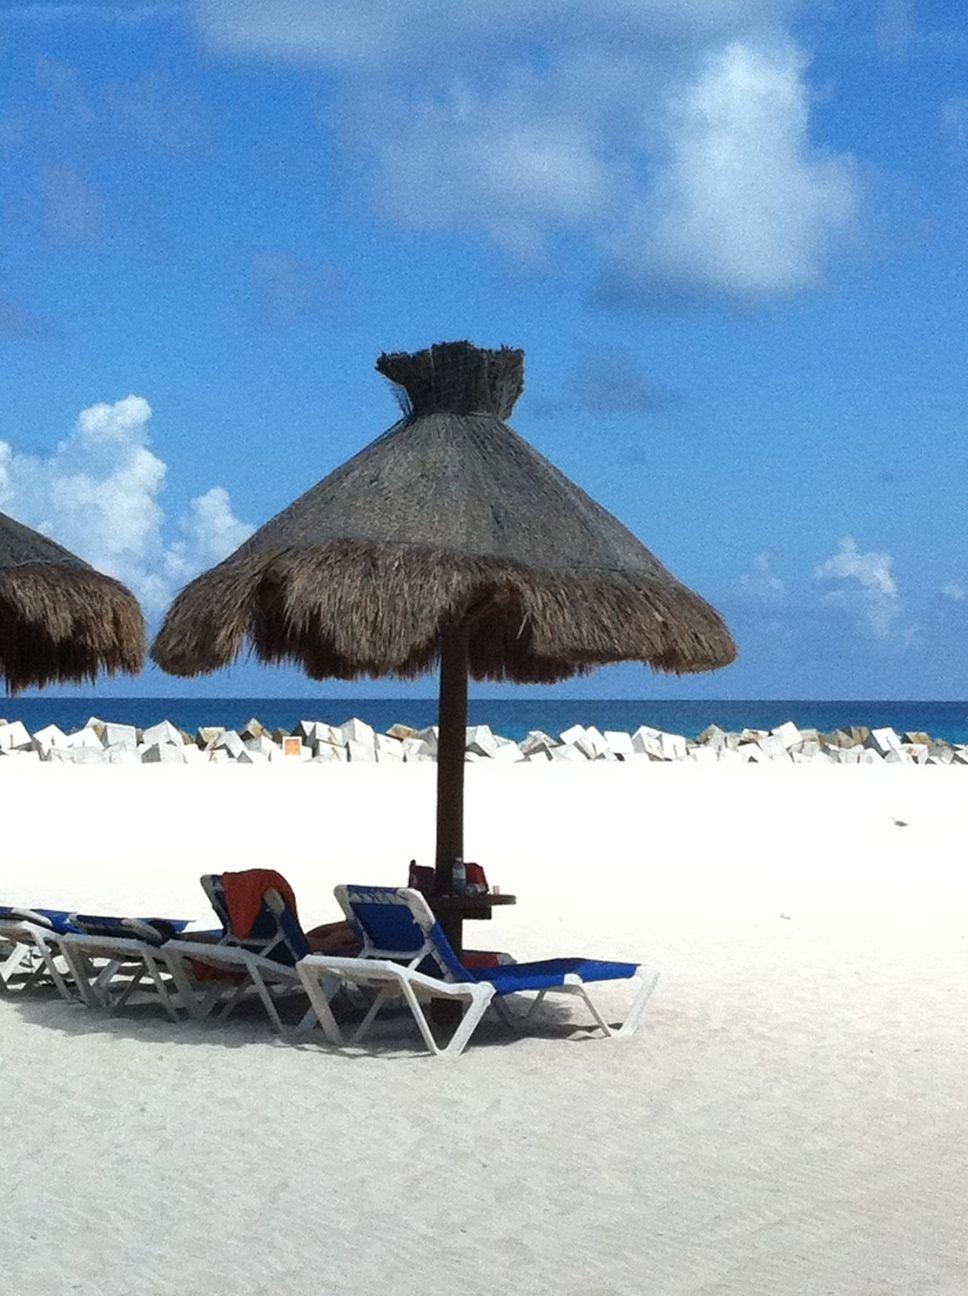 My shot of a Beach Umbrella near the DREAMS Resort in